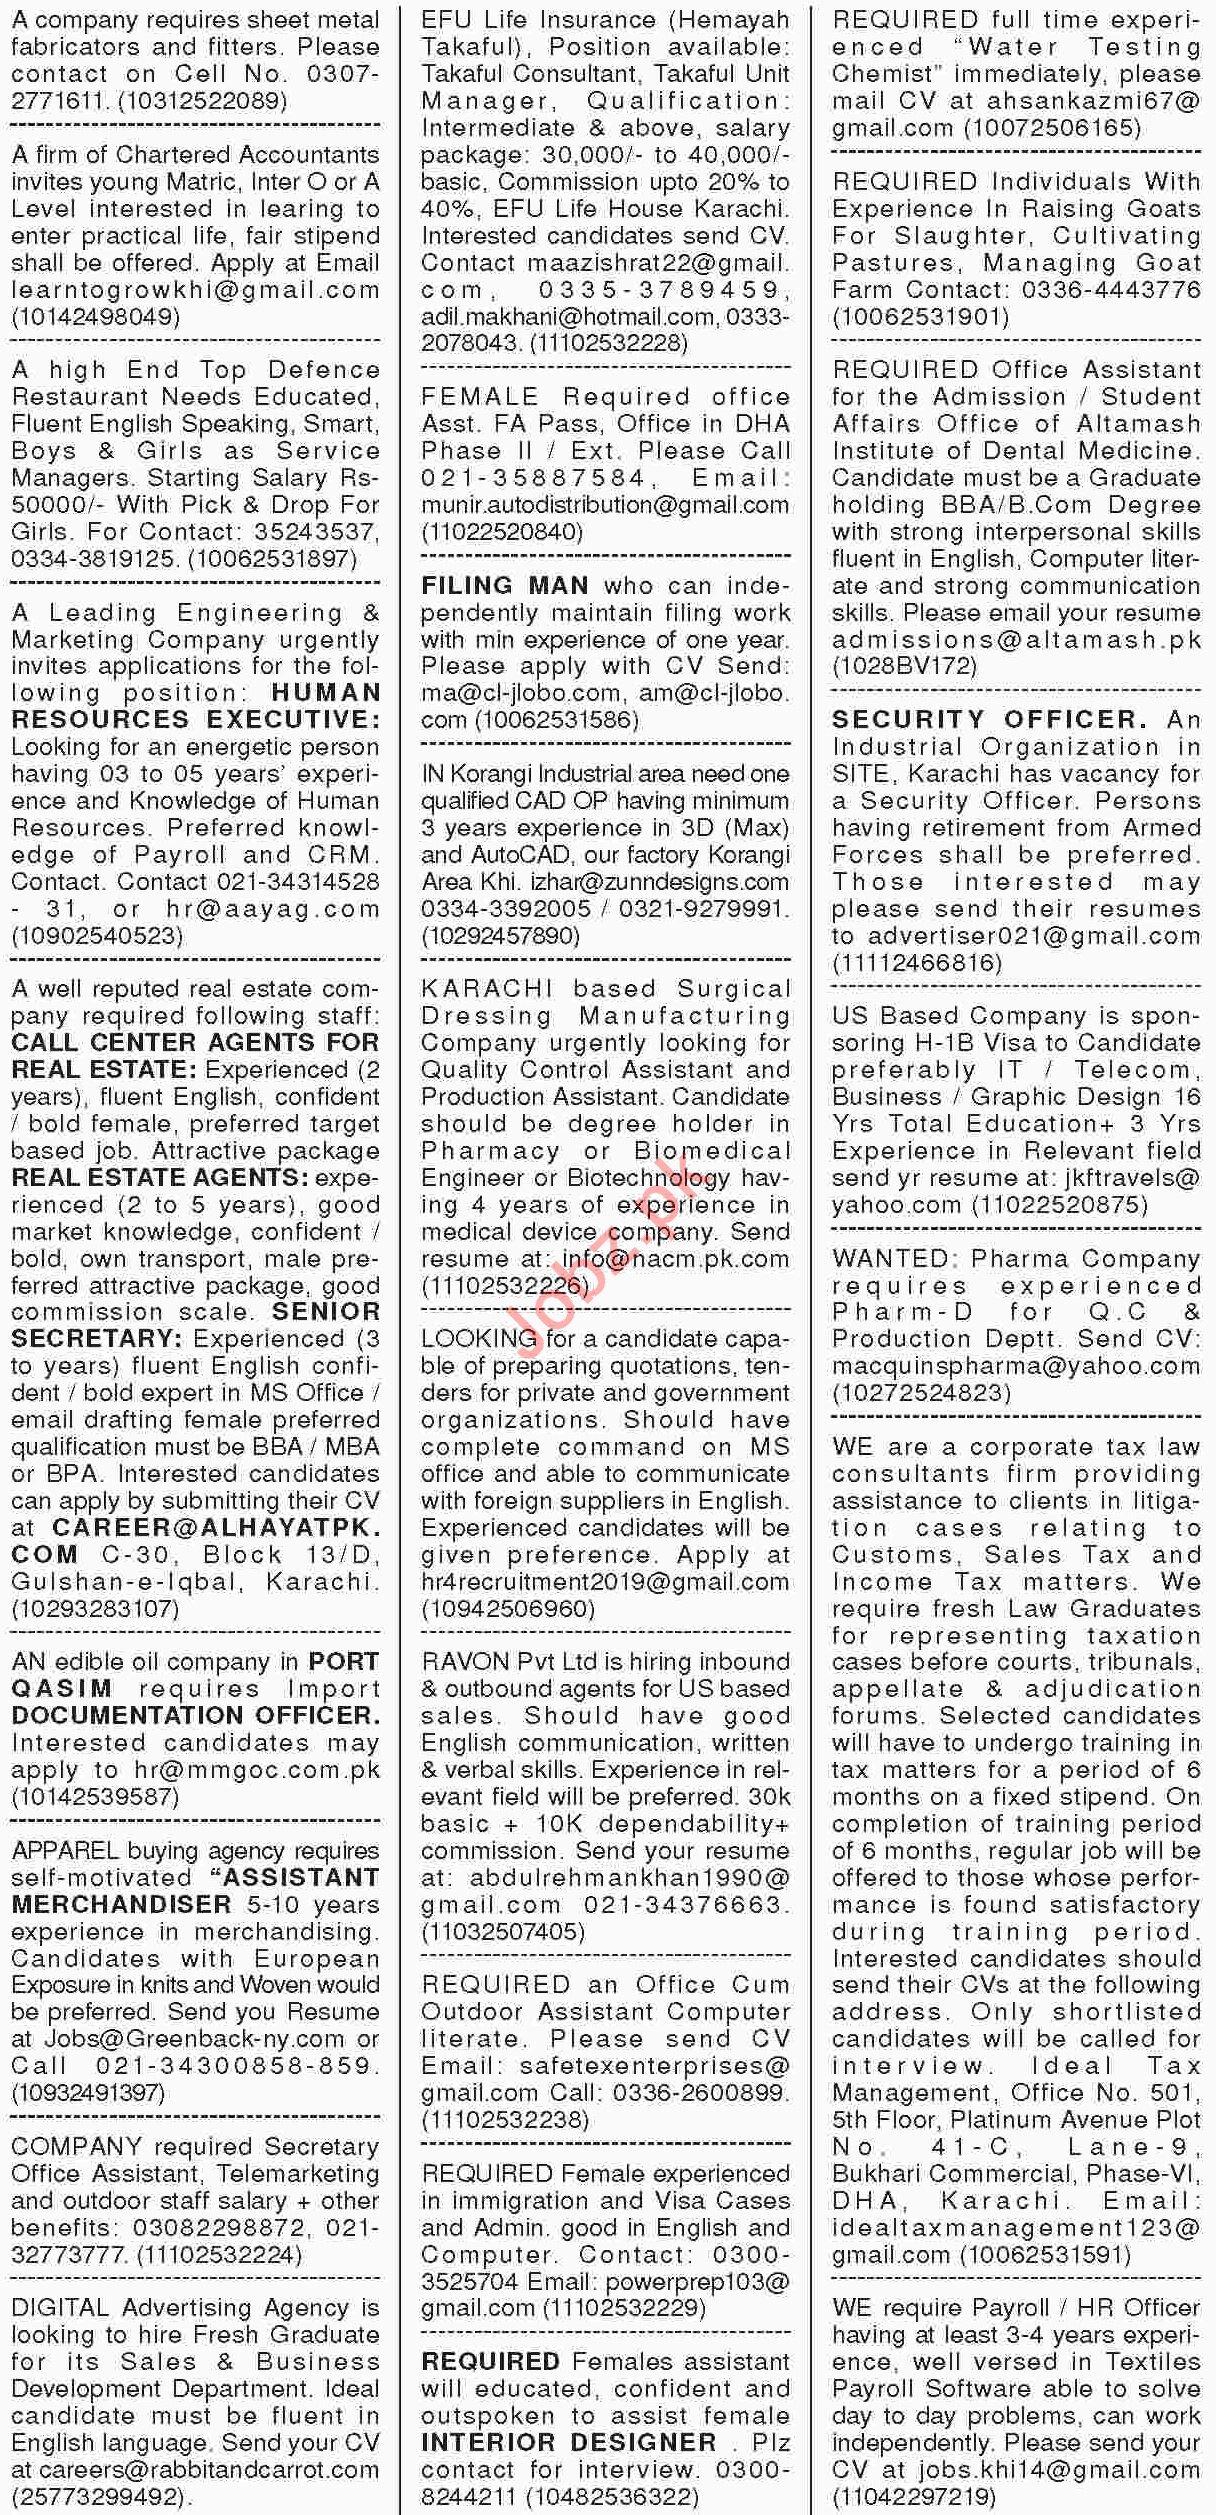 Dawn Sunday Classified Ads 10th March 2019 General Staff